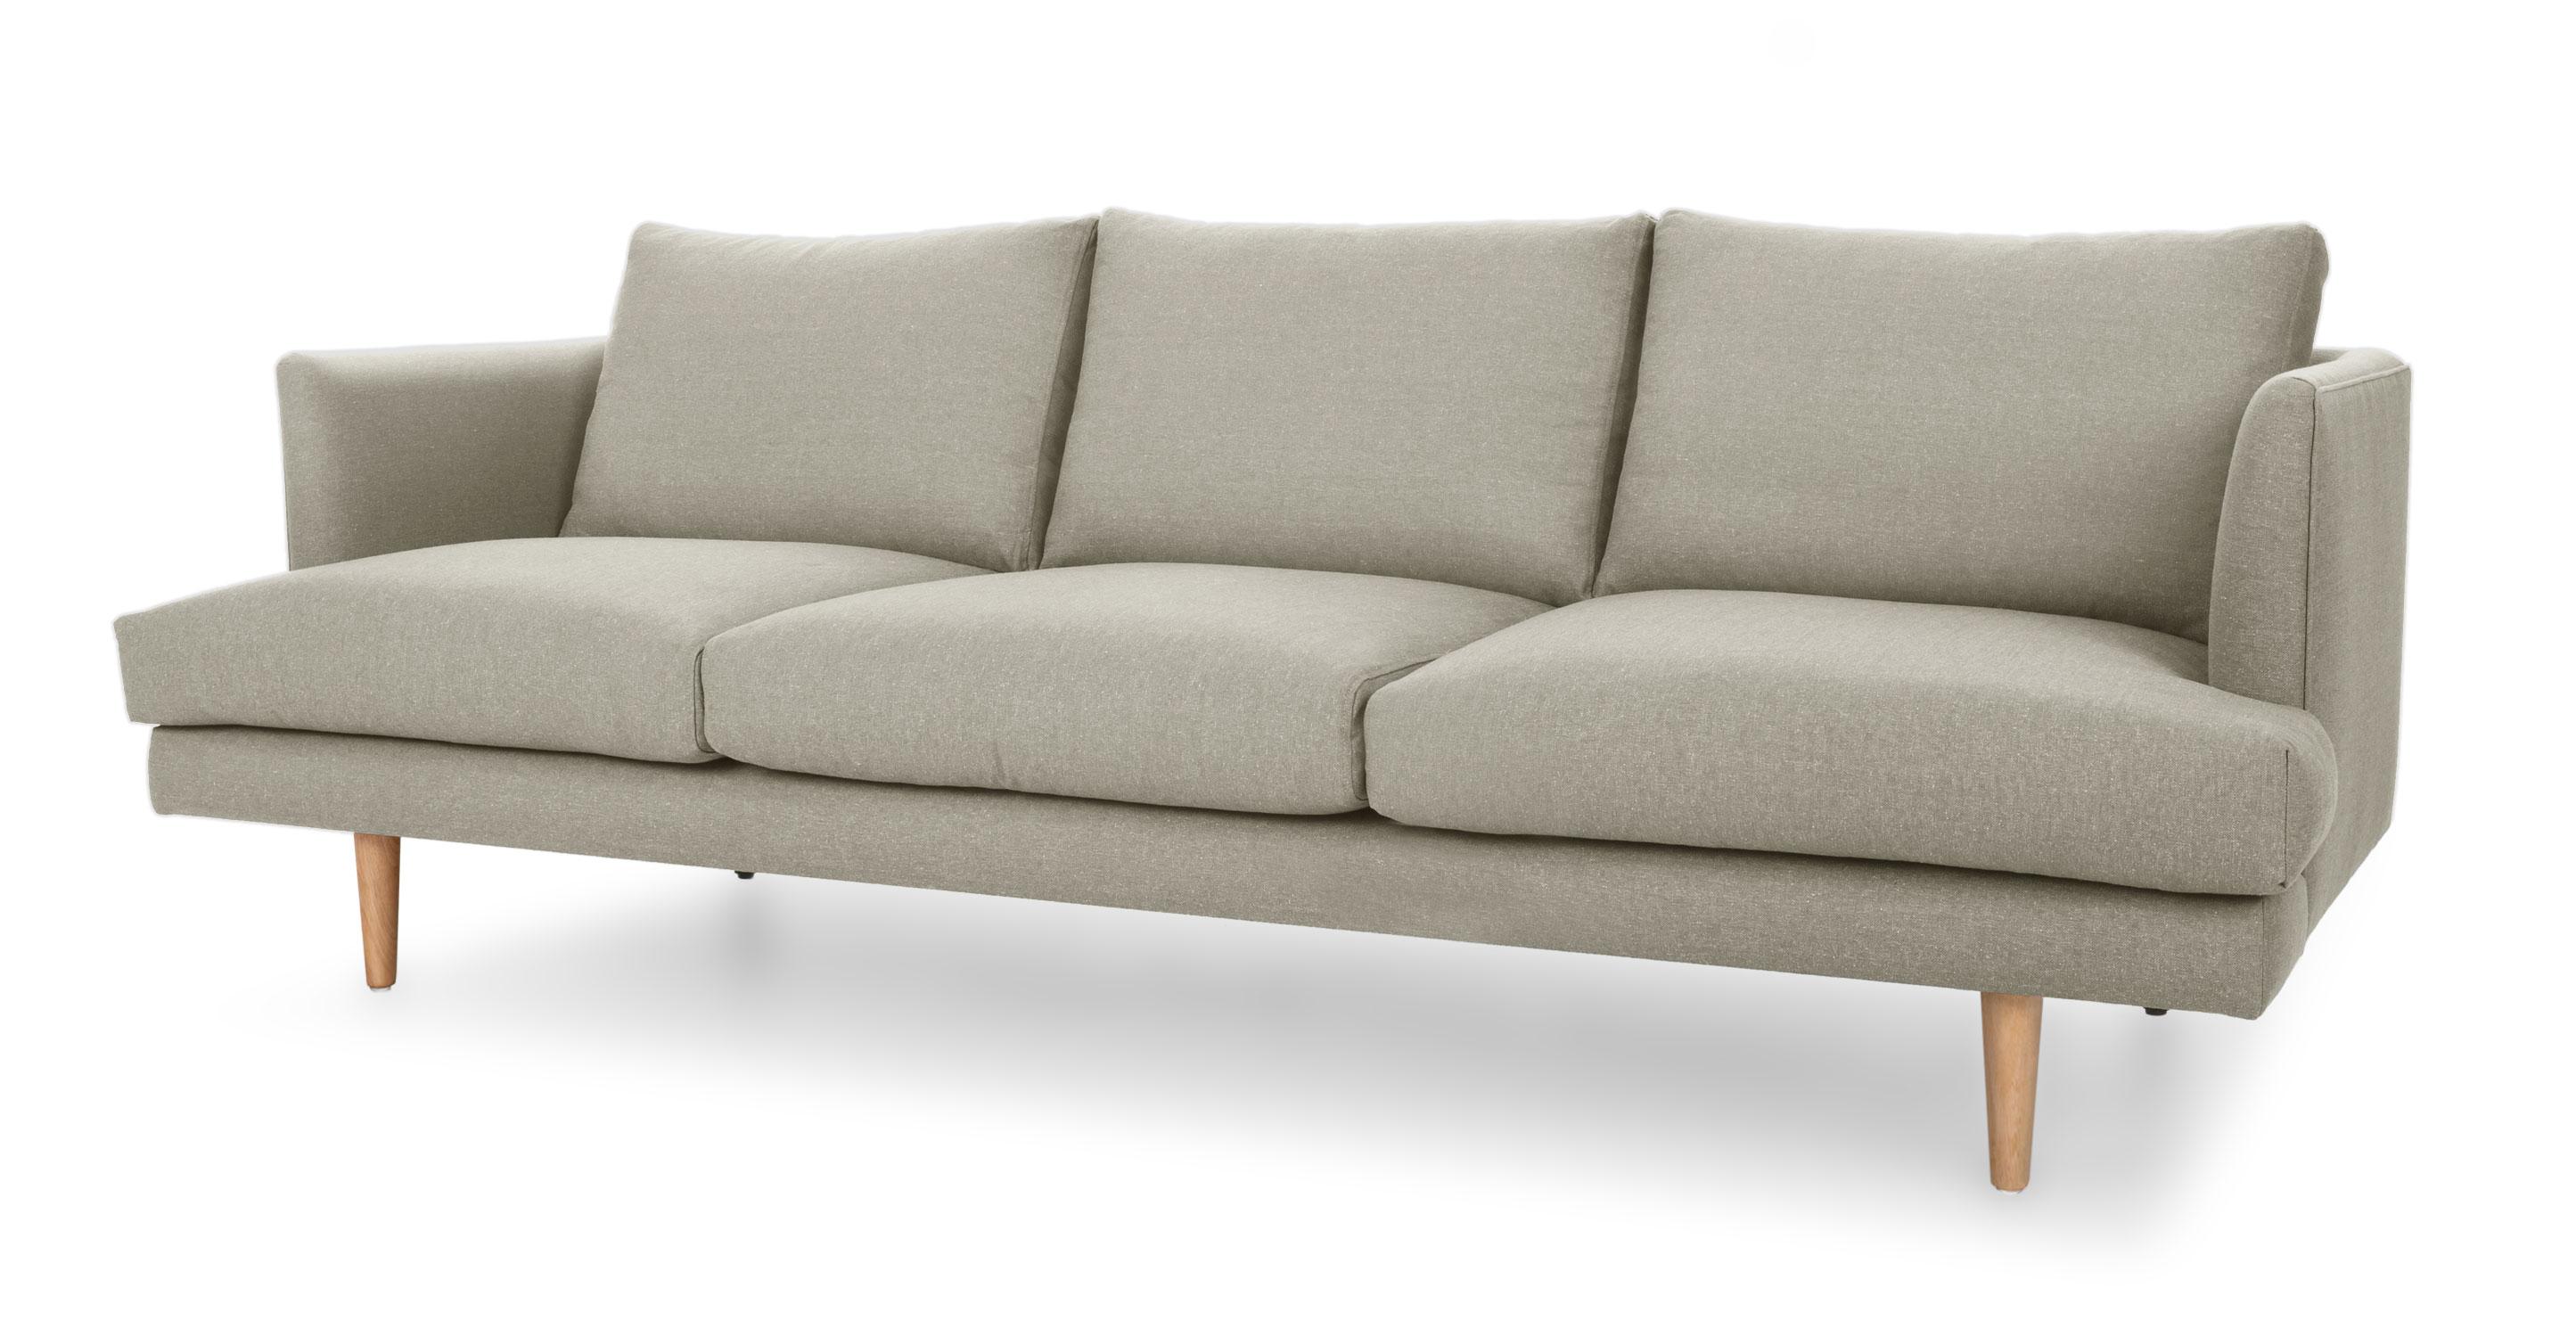 mid century style sofa canada covers edmonton carl cobble gray sofas article modern